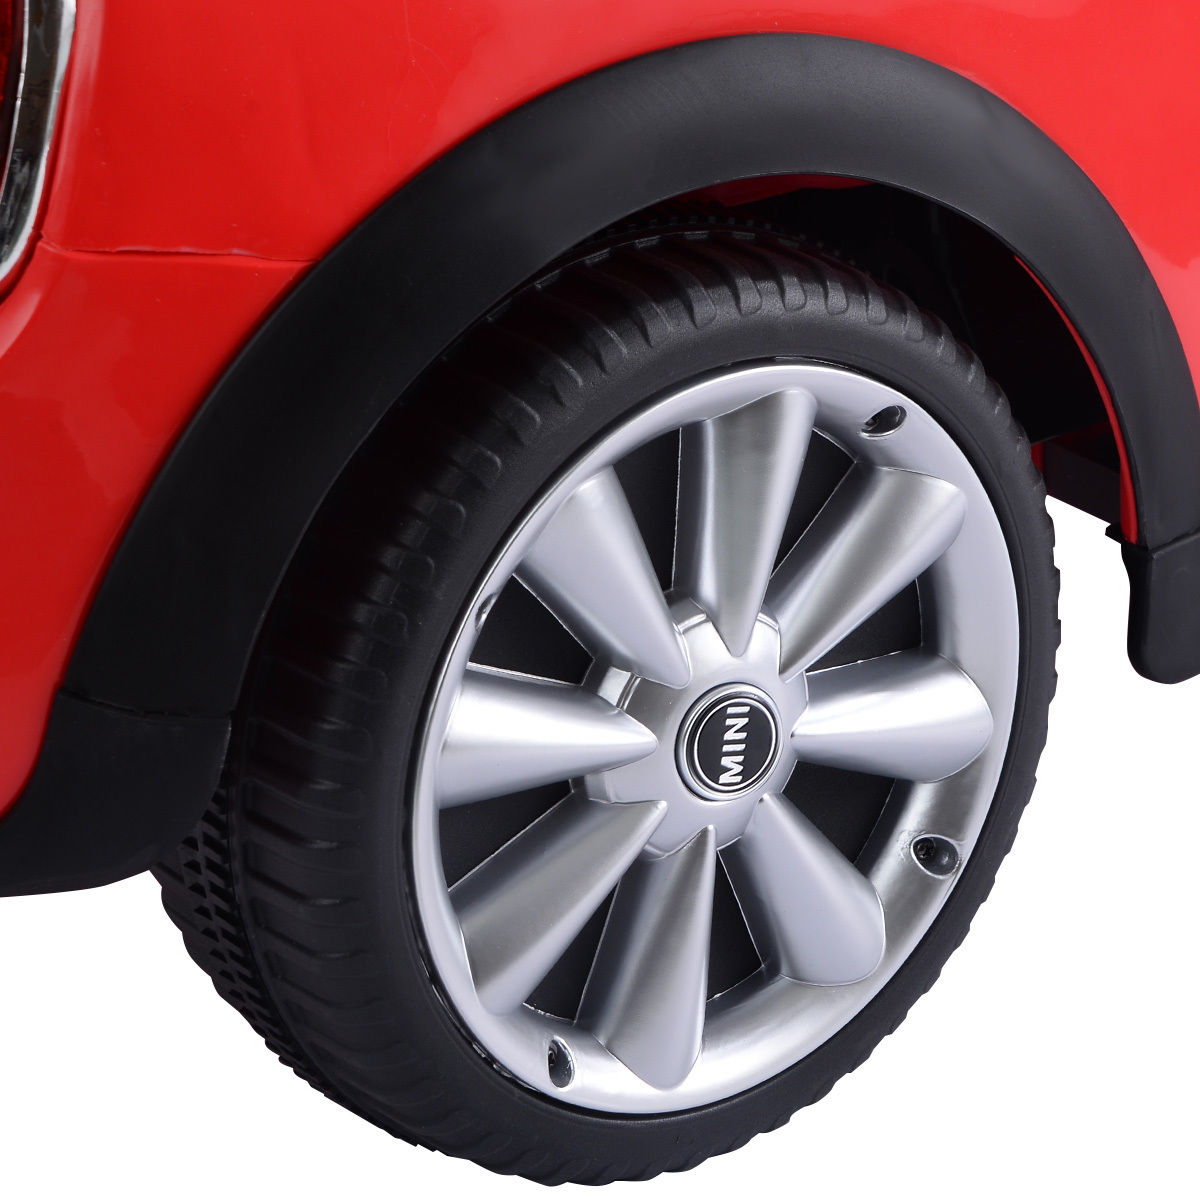 Red BMW MINI Hatch 12V Electric Kids Ride On Car Licensed MP3 RC Remote Control - image 4 de 7